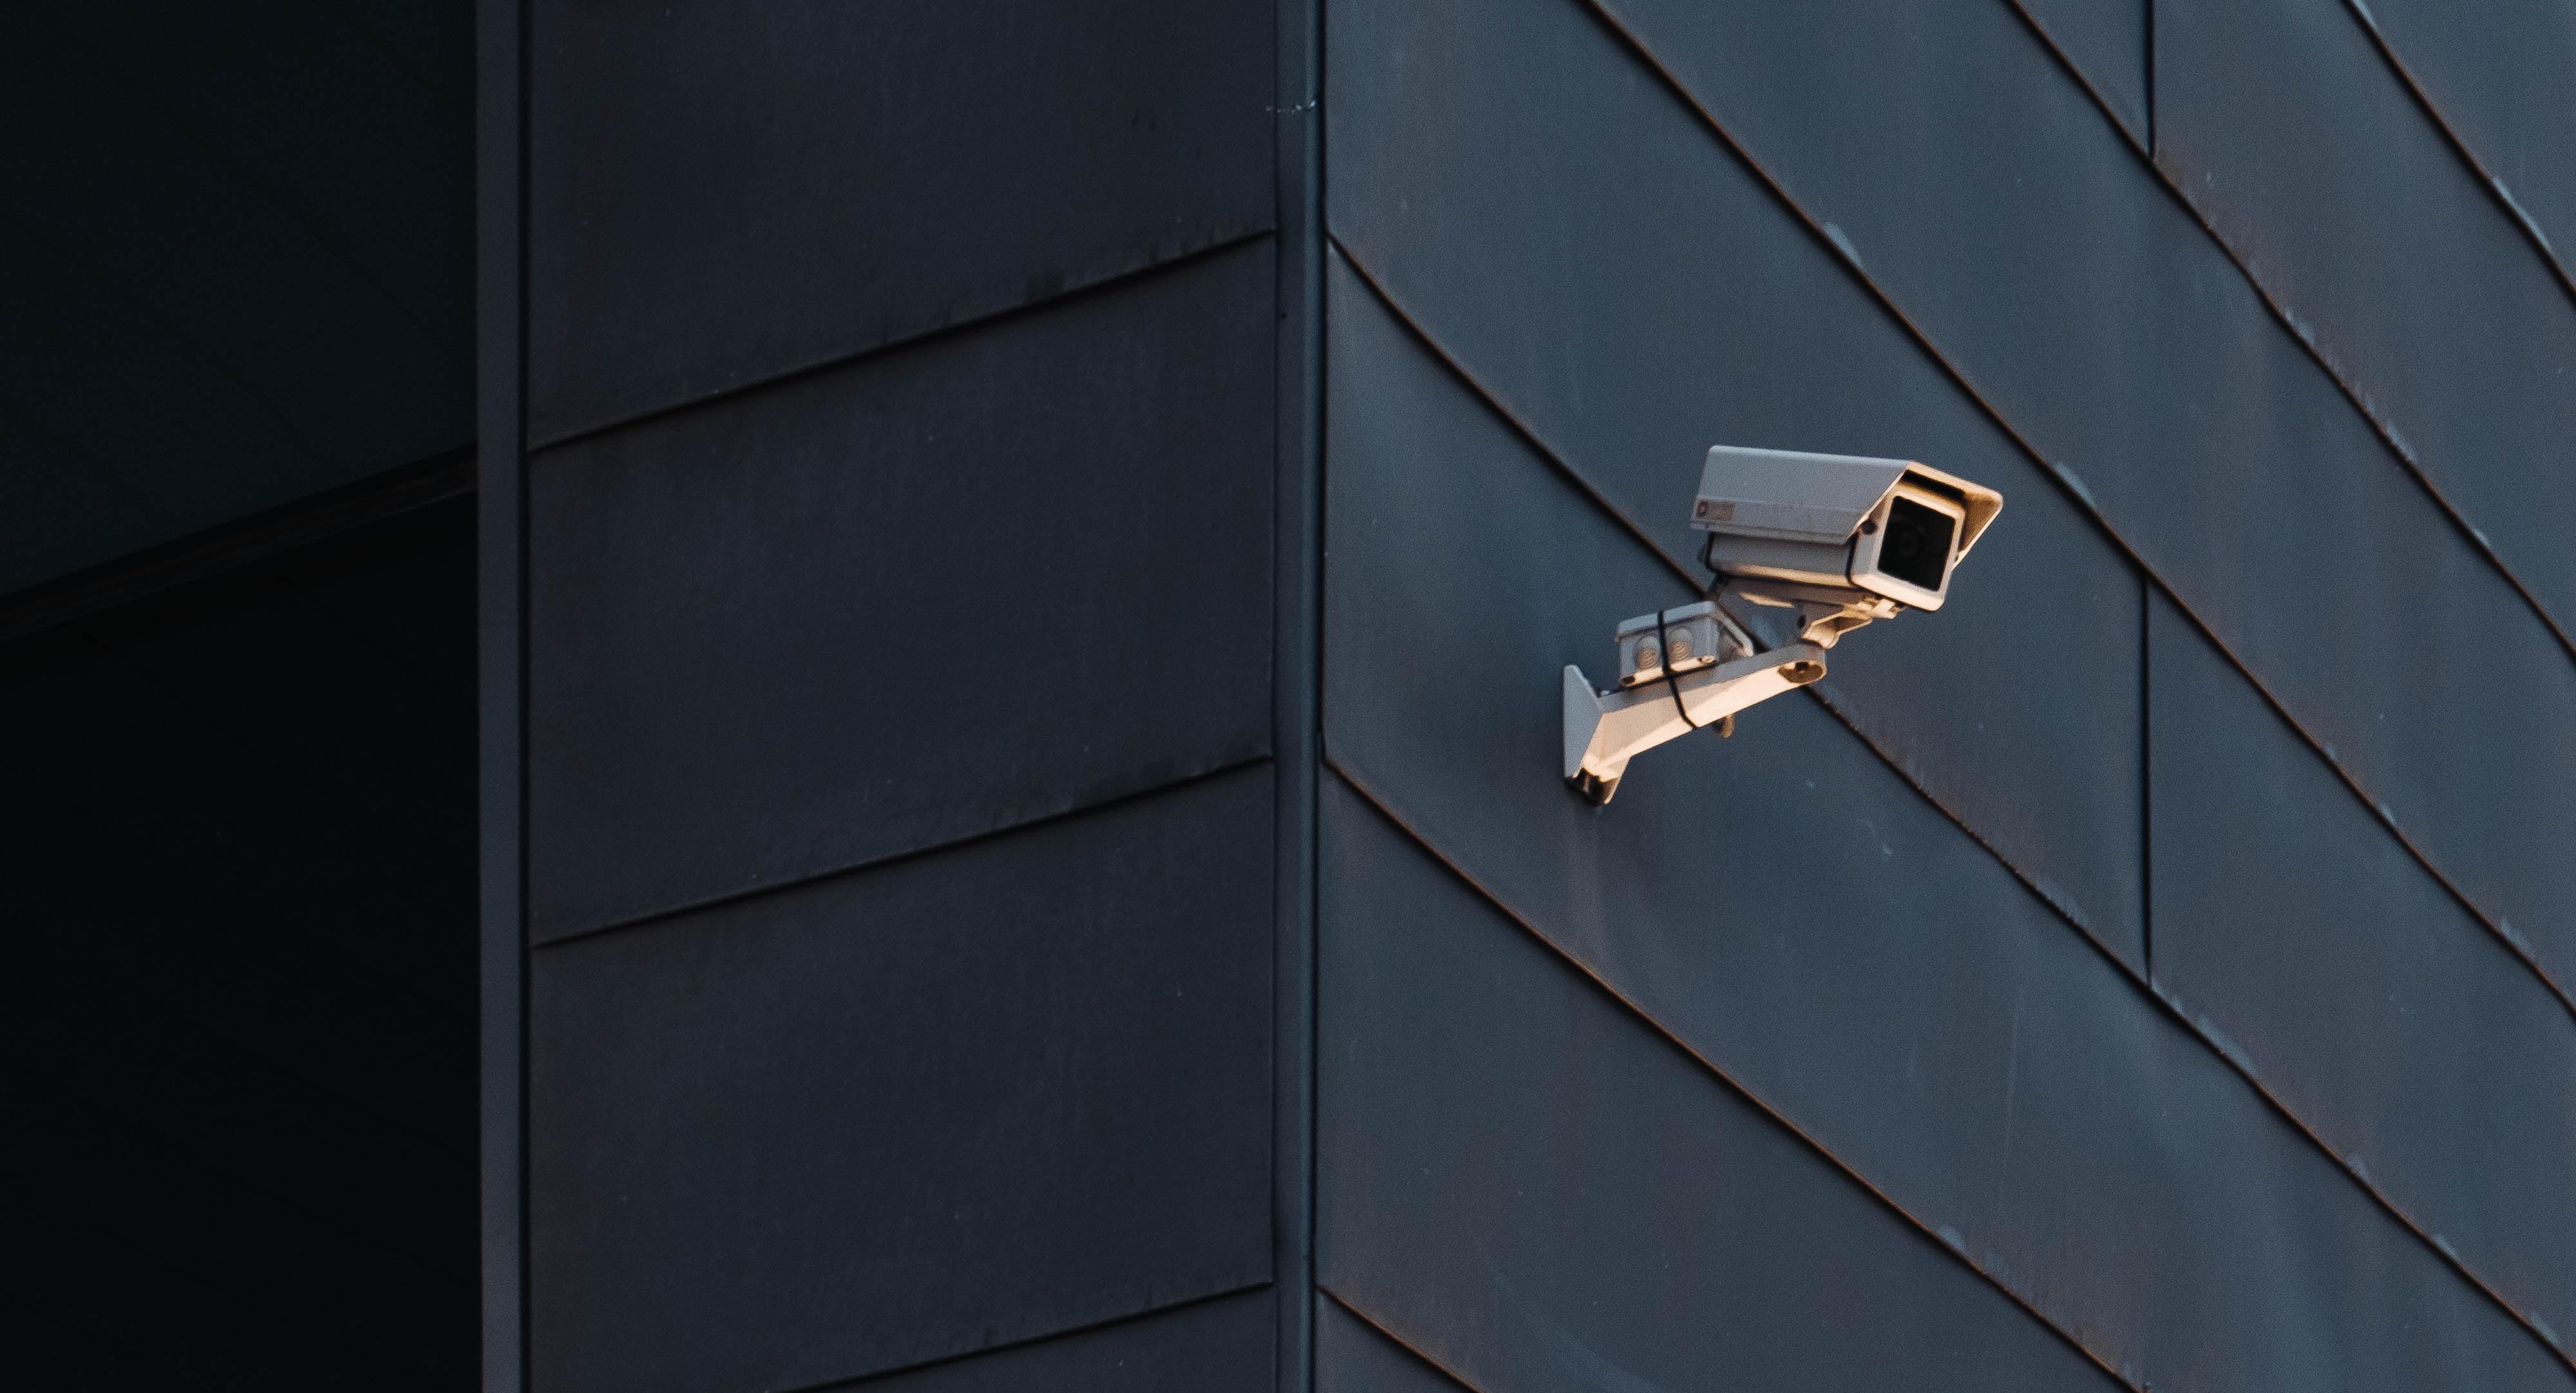 controls-assurance-security-camera-cctv